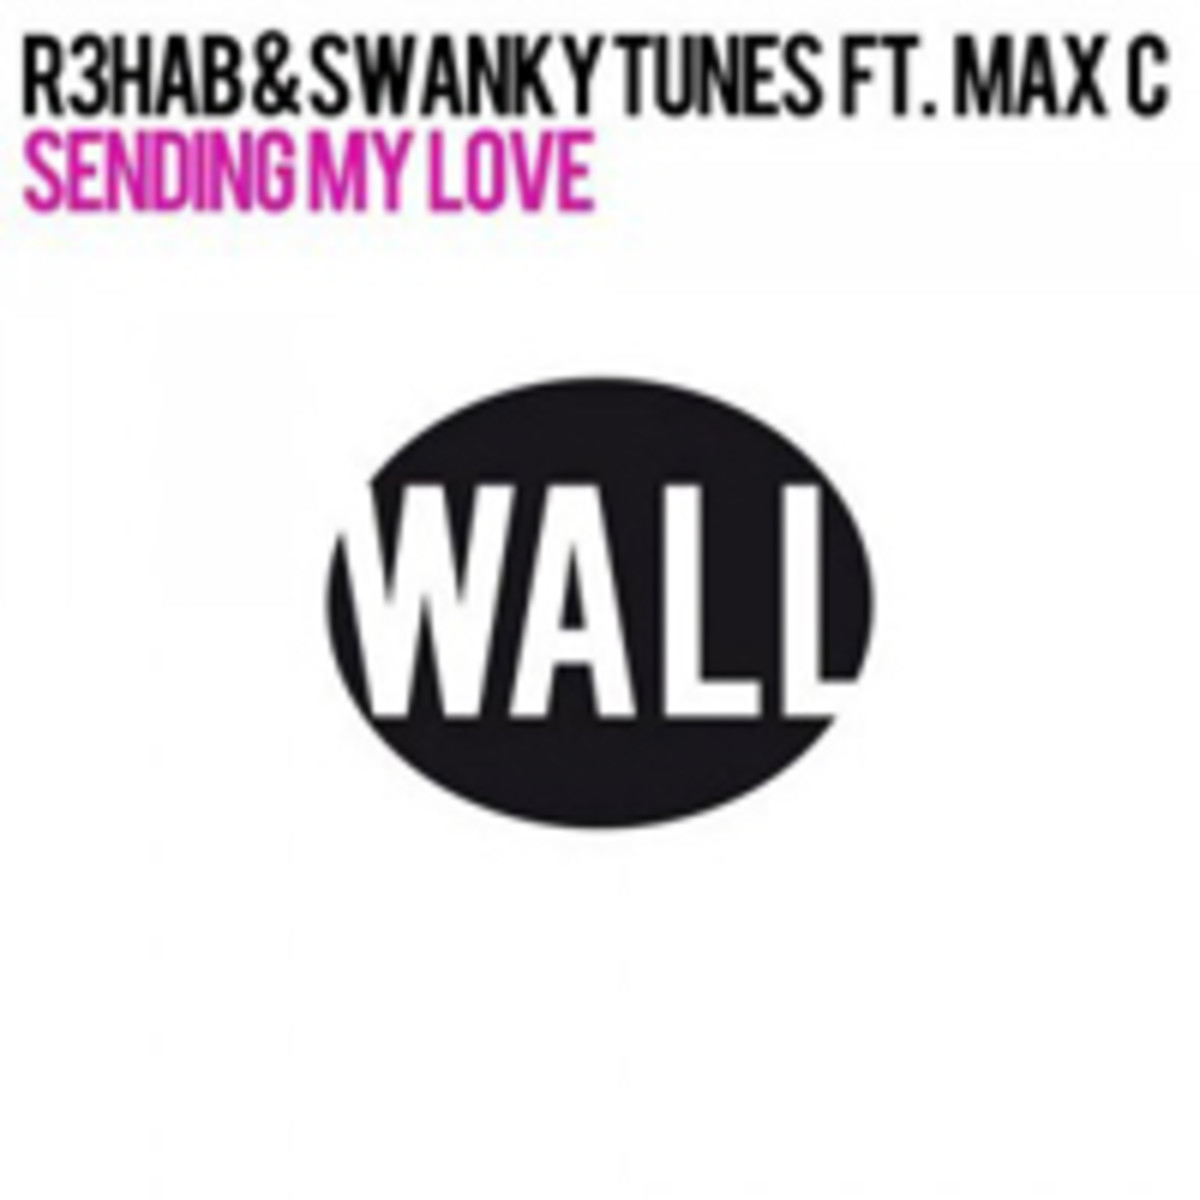 R3hab-Swanky-Tunes